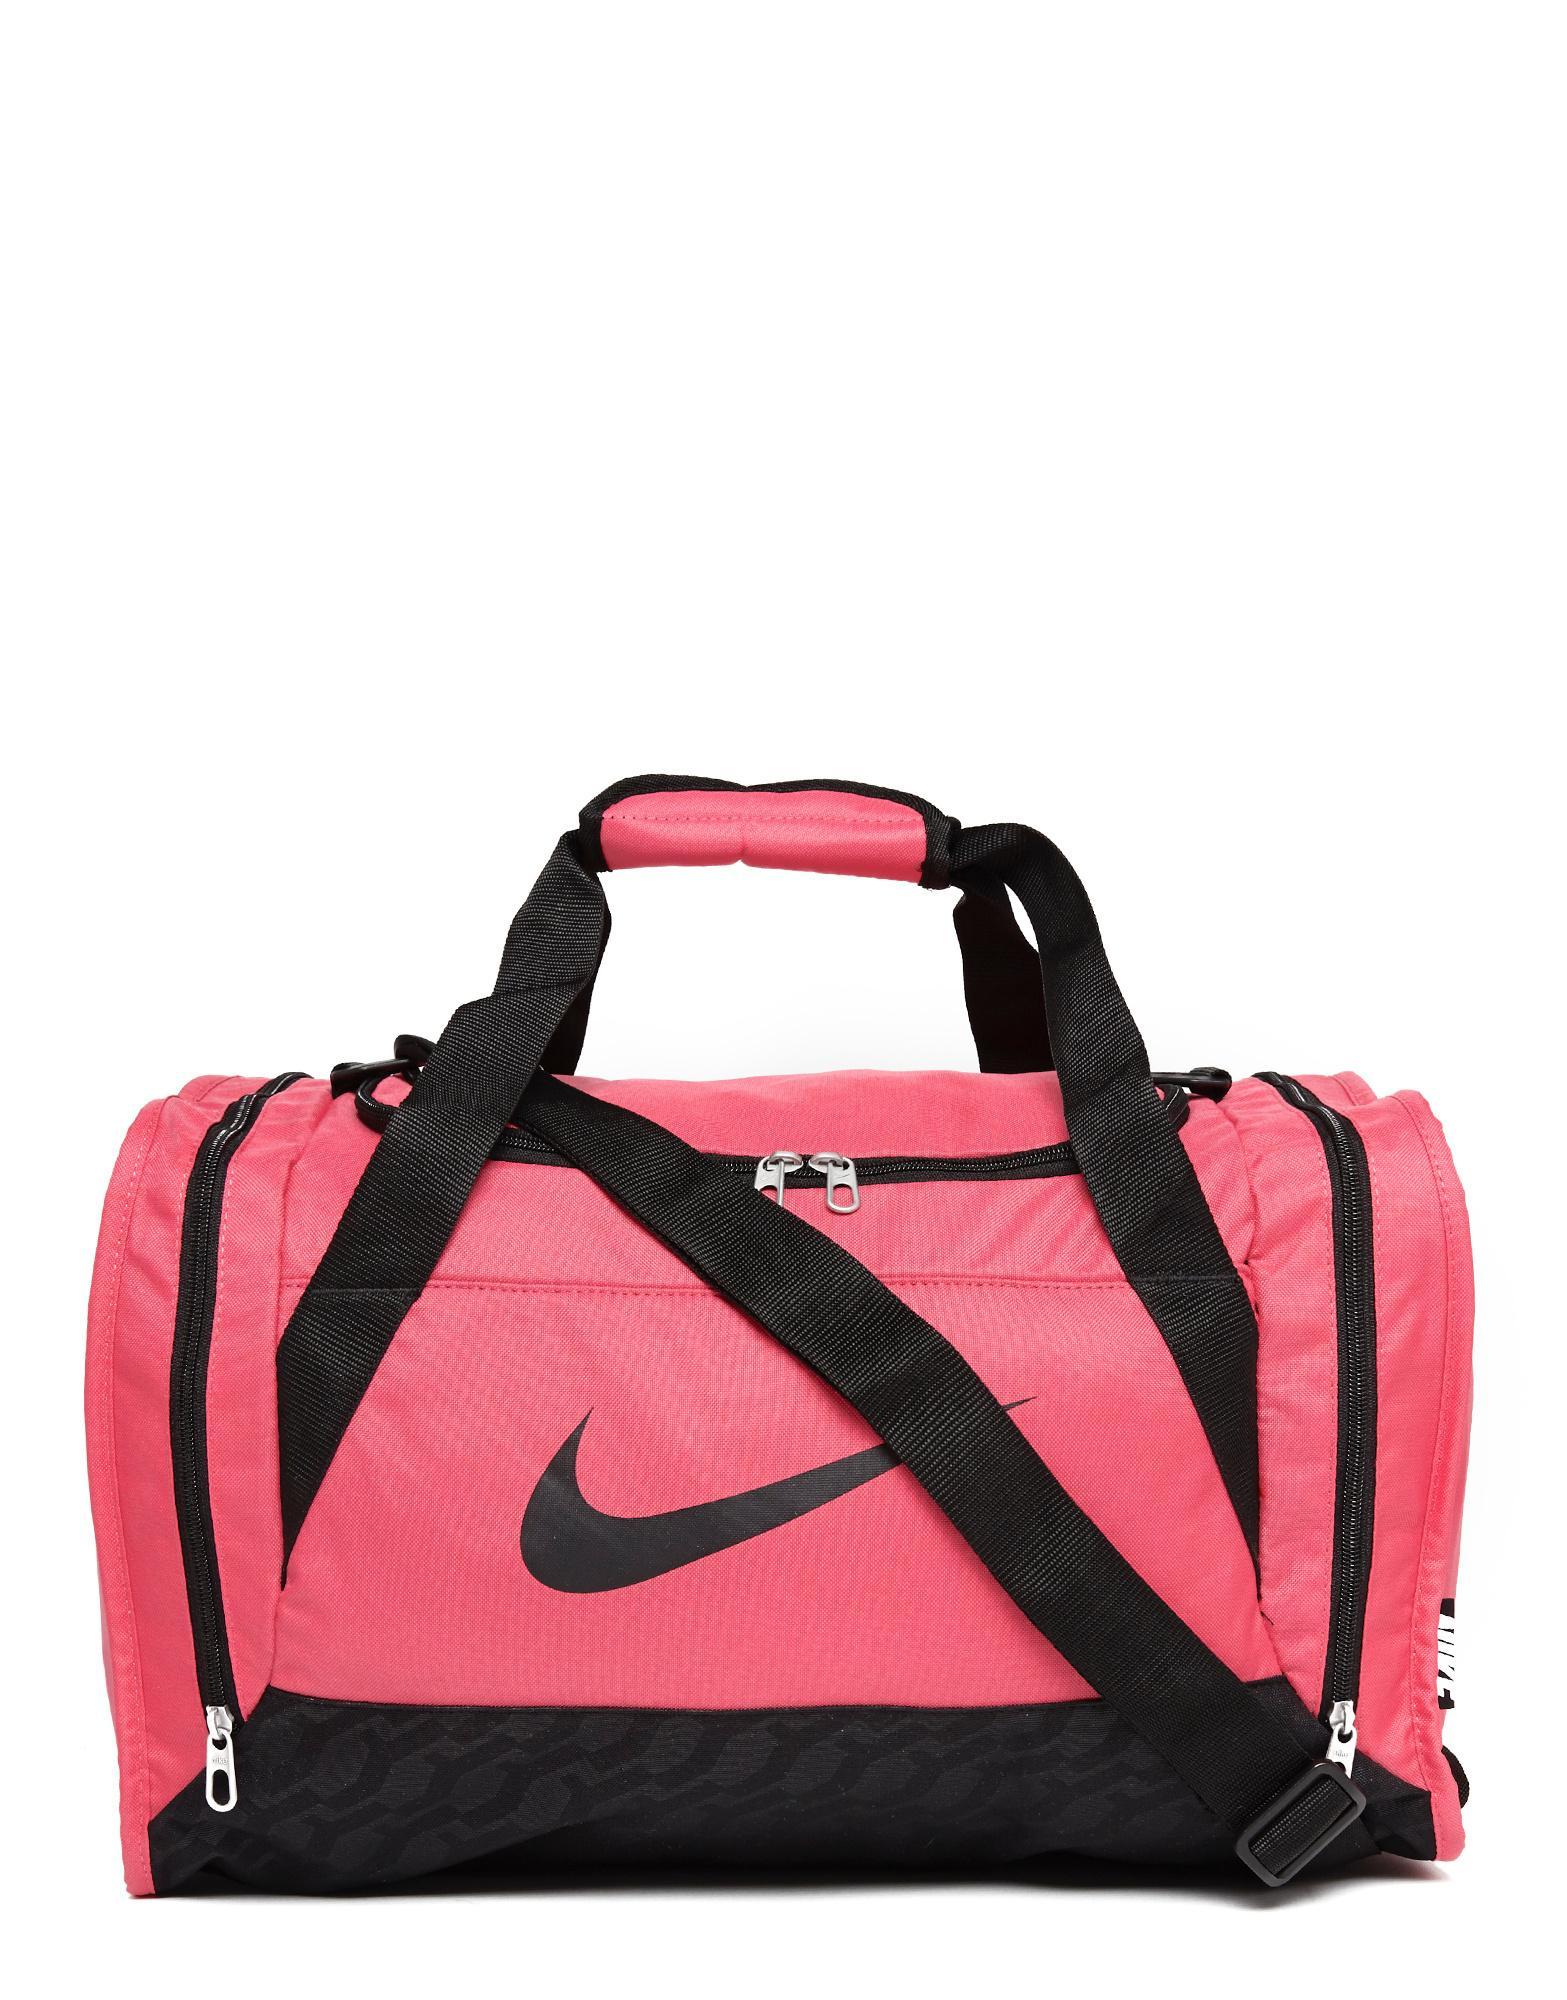 sac de sport femme nike duffel nike. Black Bedroom Furniture Sets. Home Design Ideas